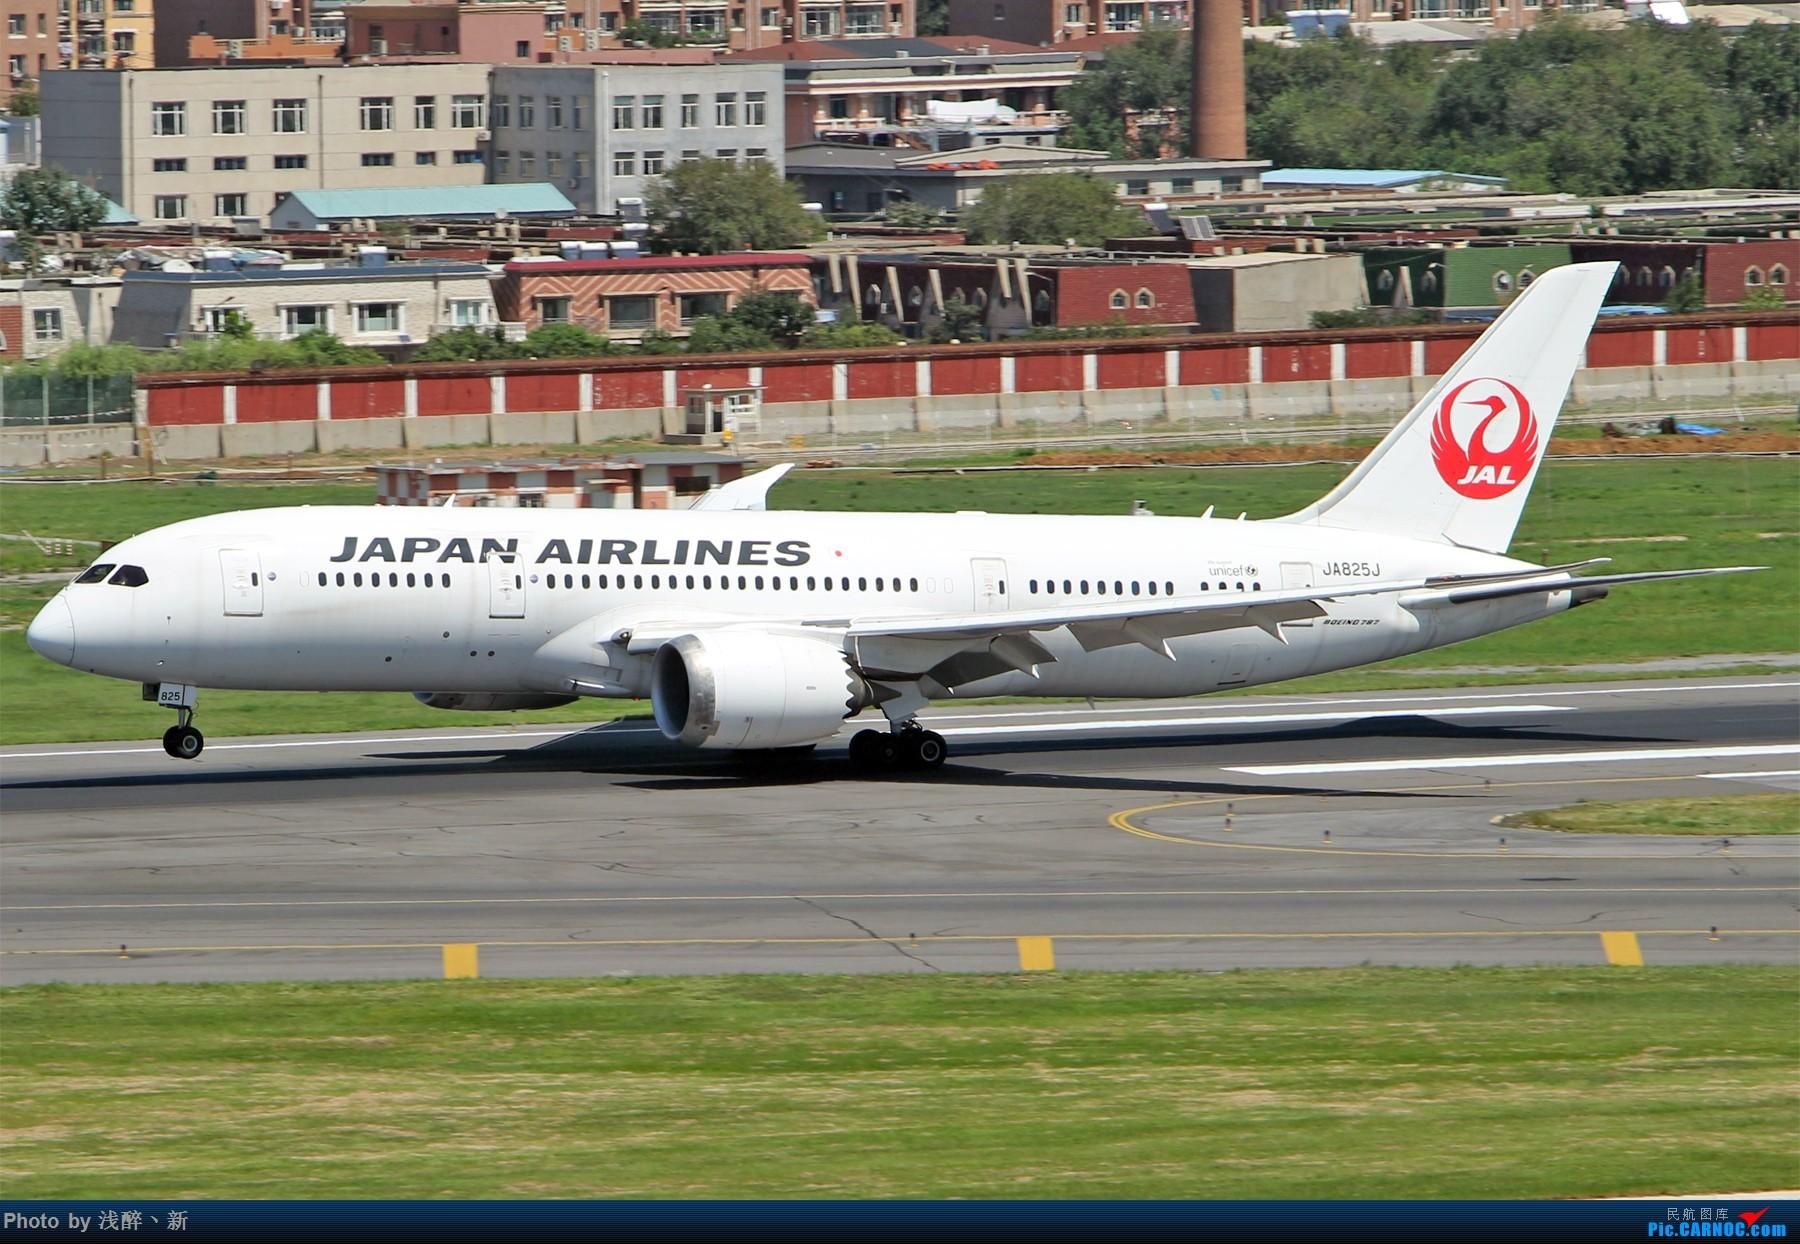 Re:[原创]DLC 8.26 日常[补] BOEING 787-8 JA825A 中国大连国际机场